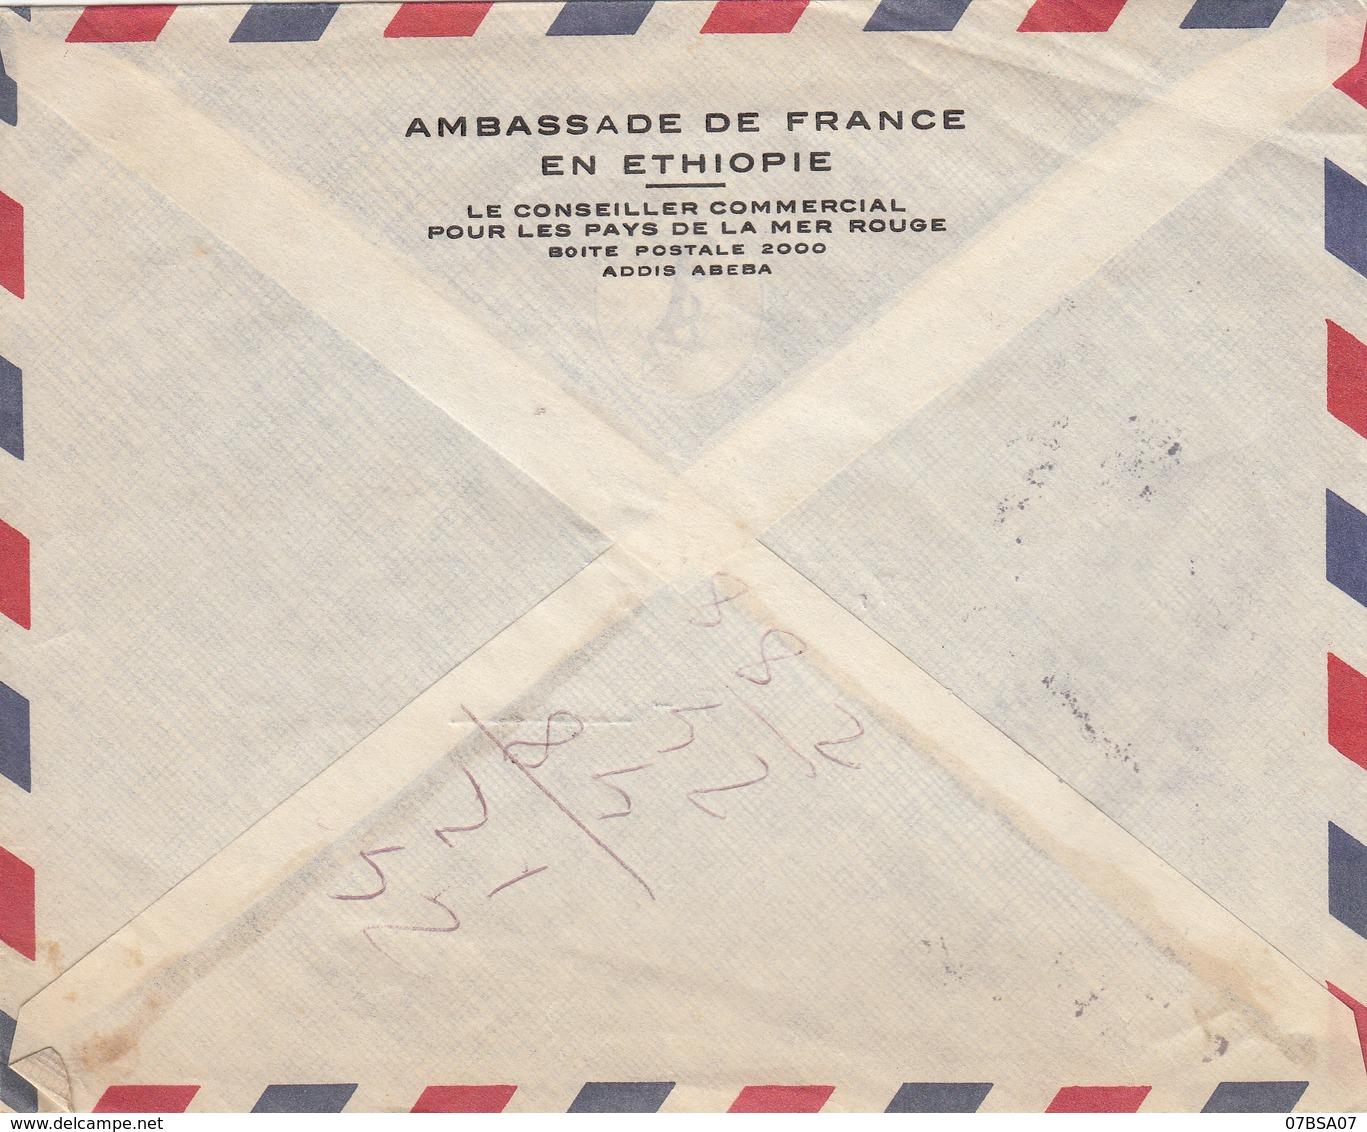 ETHIOPIE AMBASSADE FRANCE VALISE DIPLOMATIQUE ENV 1967 ADDIS ABEBA => MINISTERE FINANCES PARIS => MIS AU BUREAU DE POSTE - Ethiopie